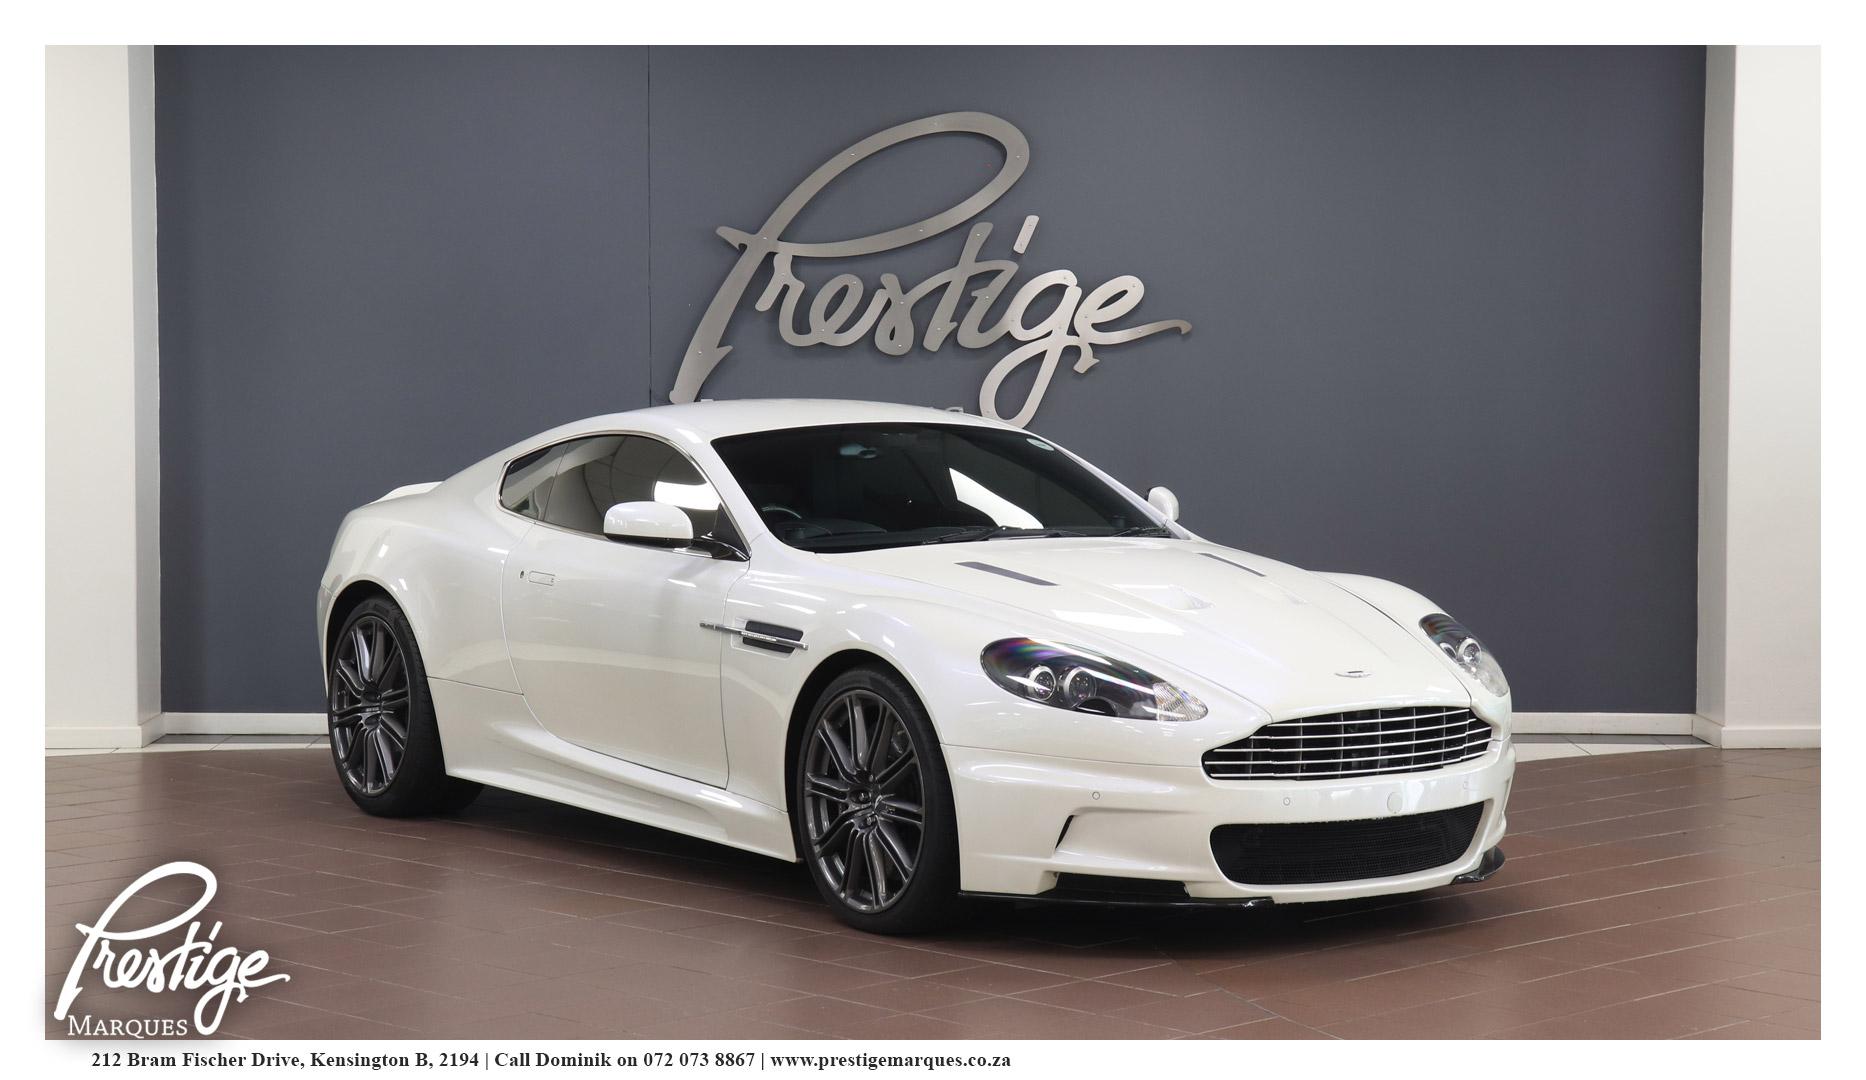 Aston-Martin-DBS-Coupe-Auto-2009-Prestige-Marques-Randburg-Sandton-1